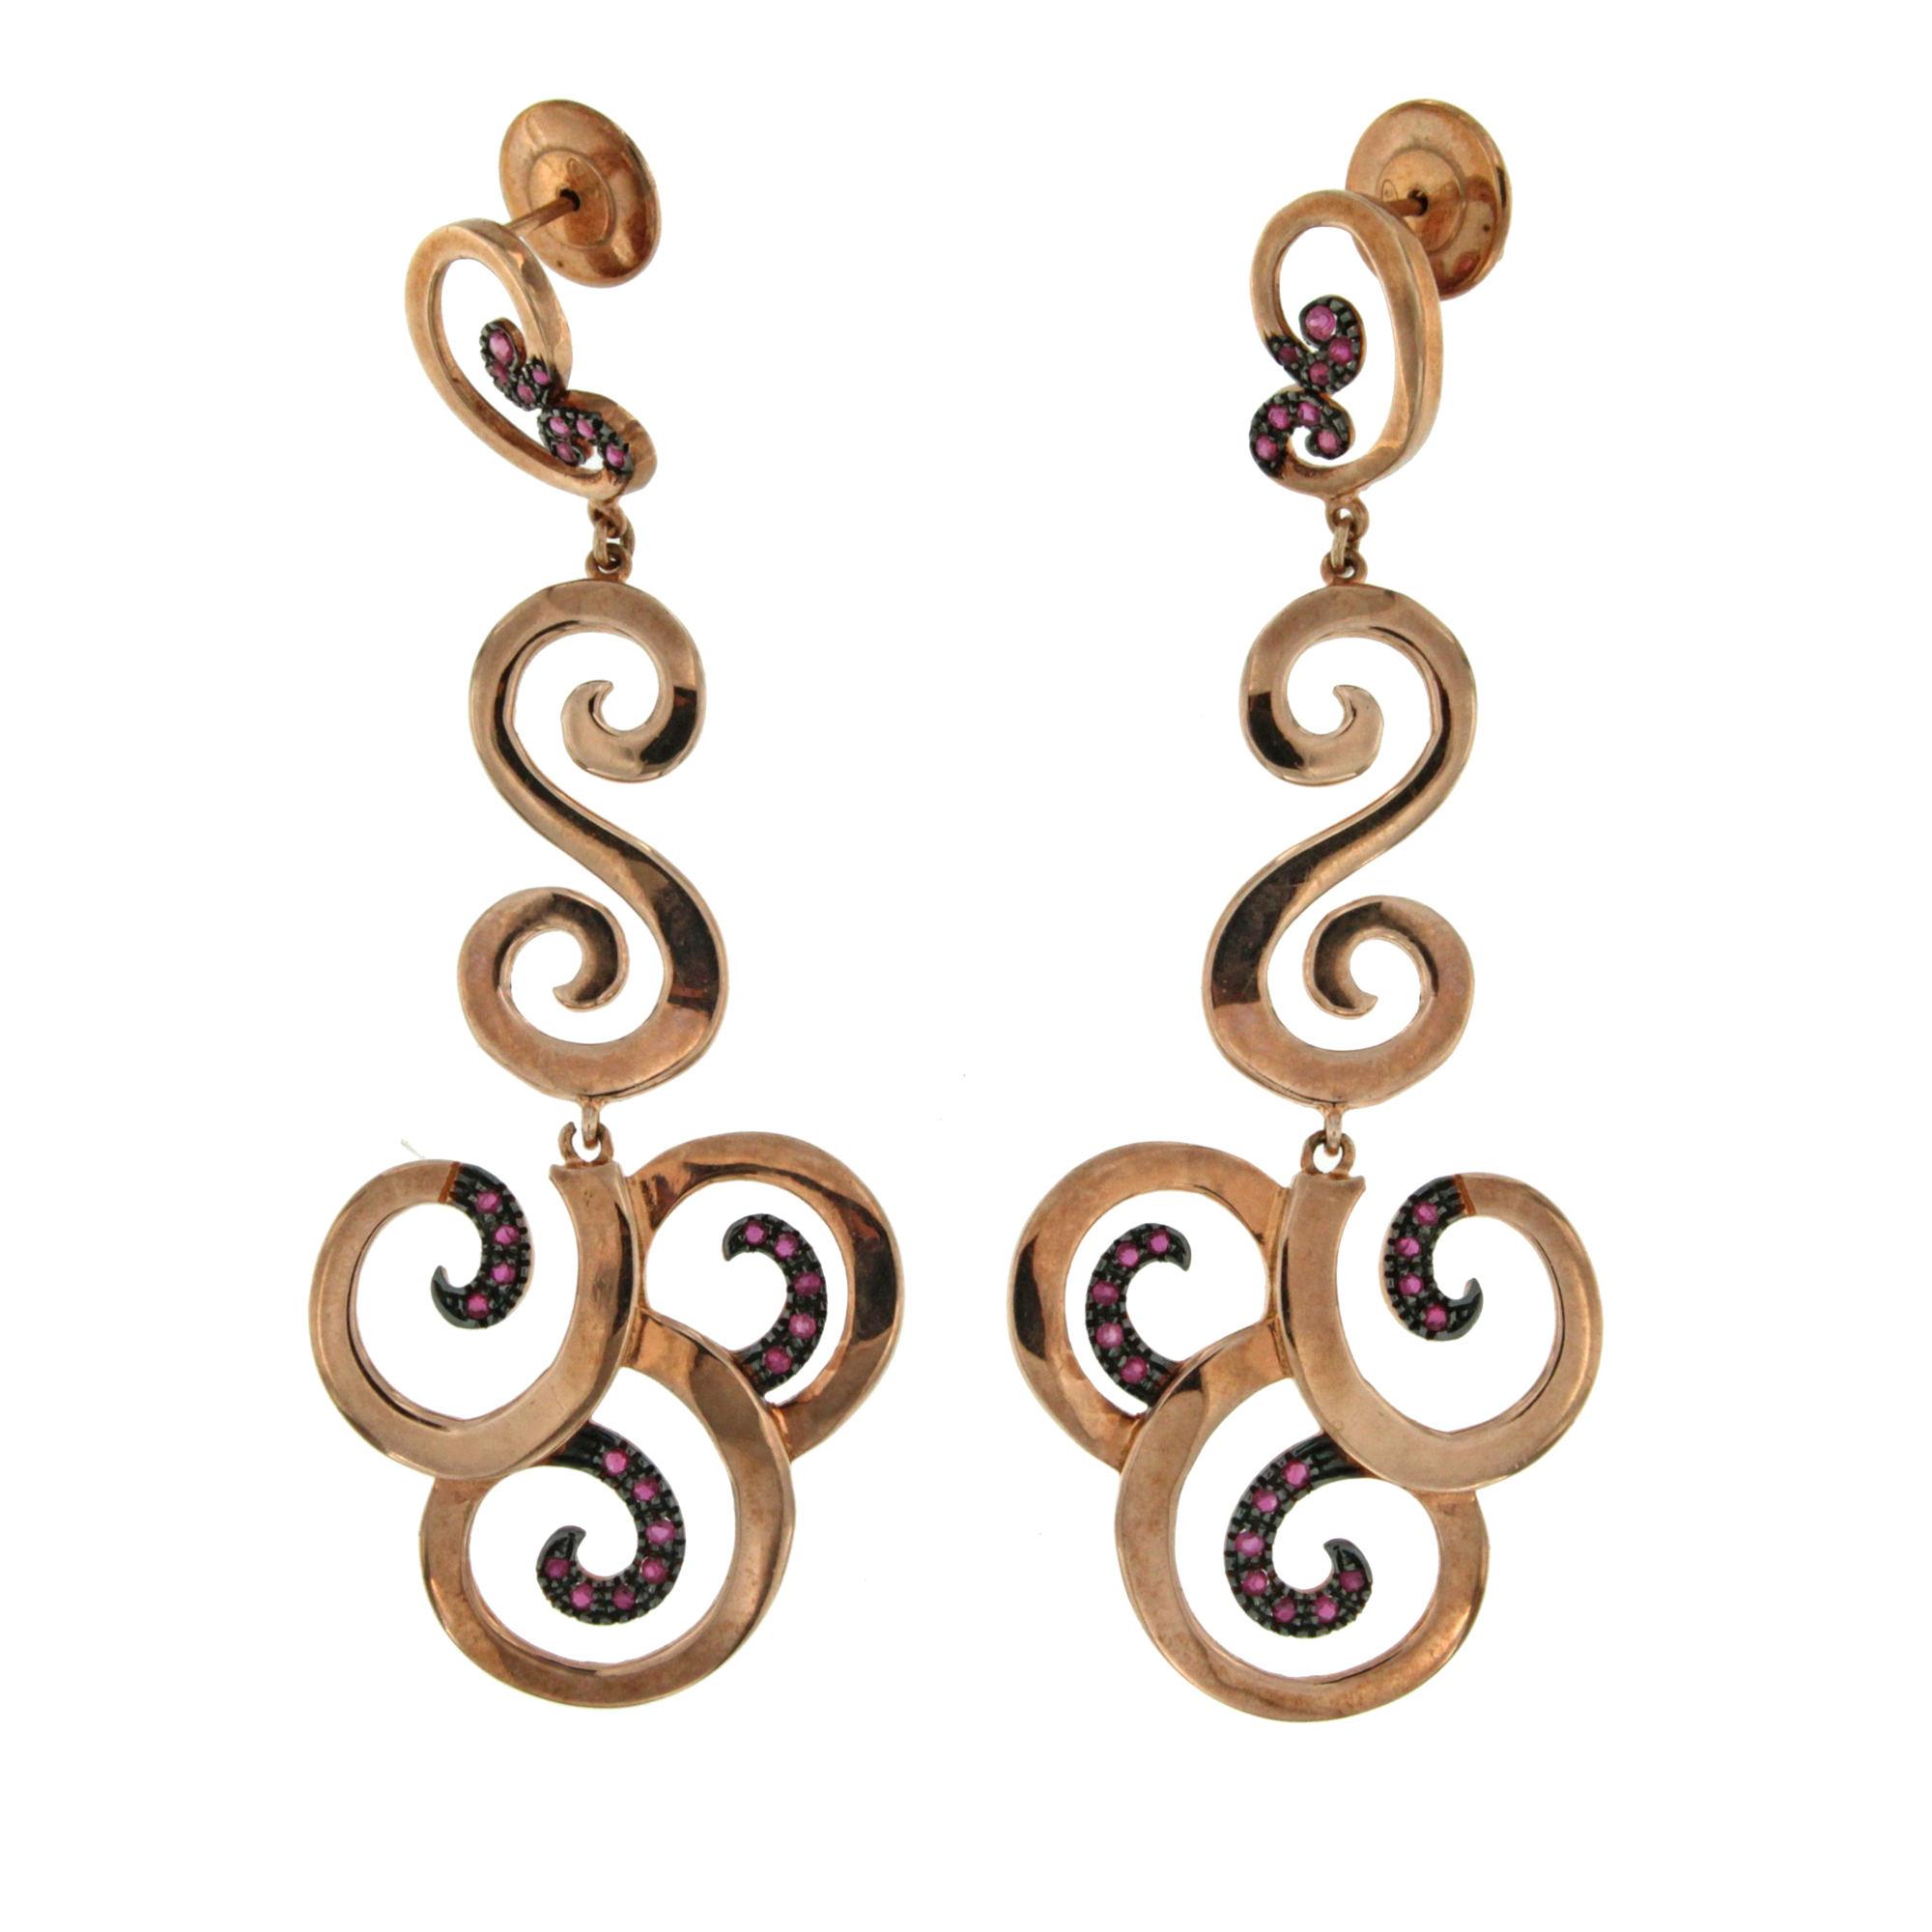 silver pendant earring rose gold plated orecchini pendenti argento De Maria